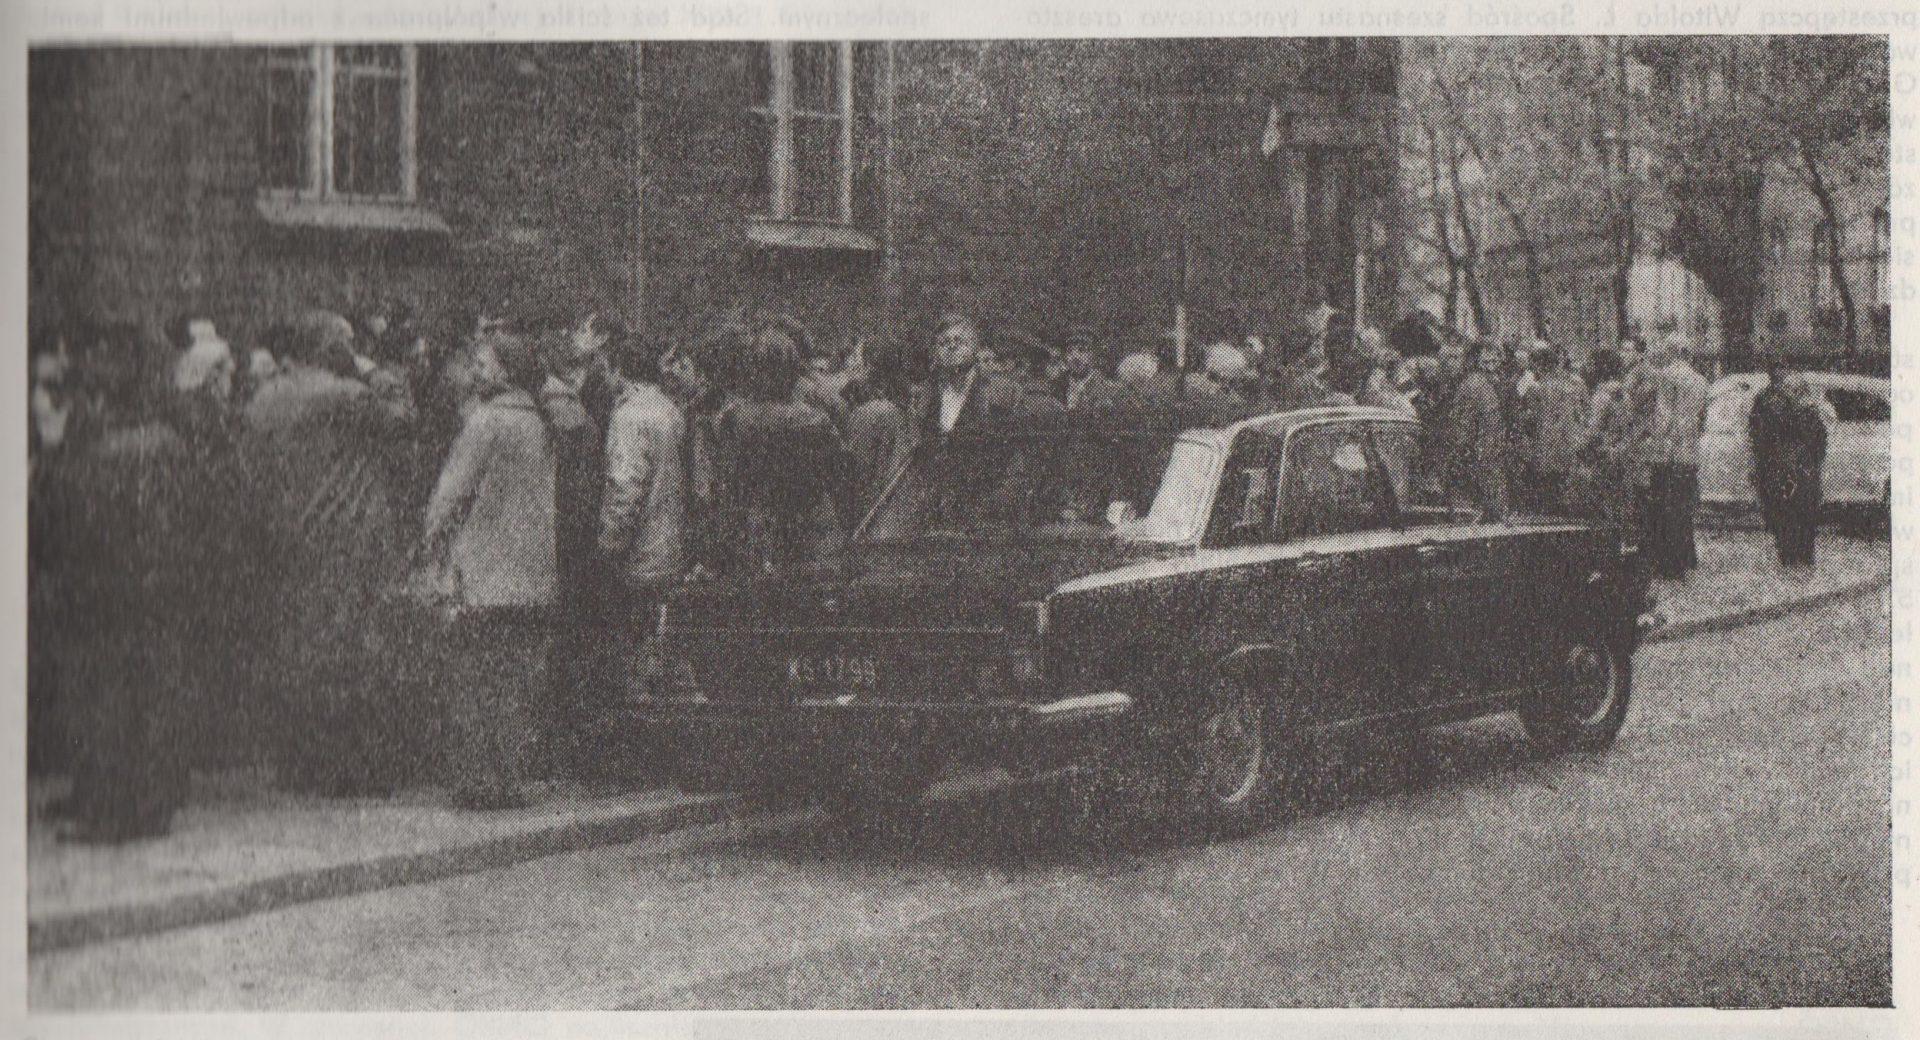 Kolejka po paszport. PRL. Źródło: Kronika Krakowa 1976 - 1977.